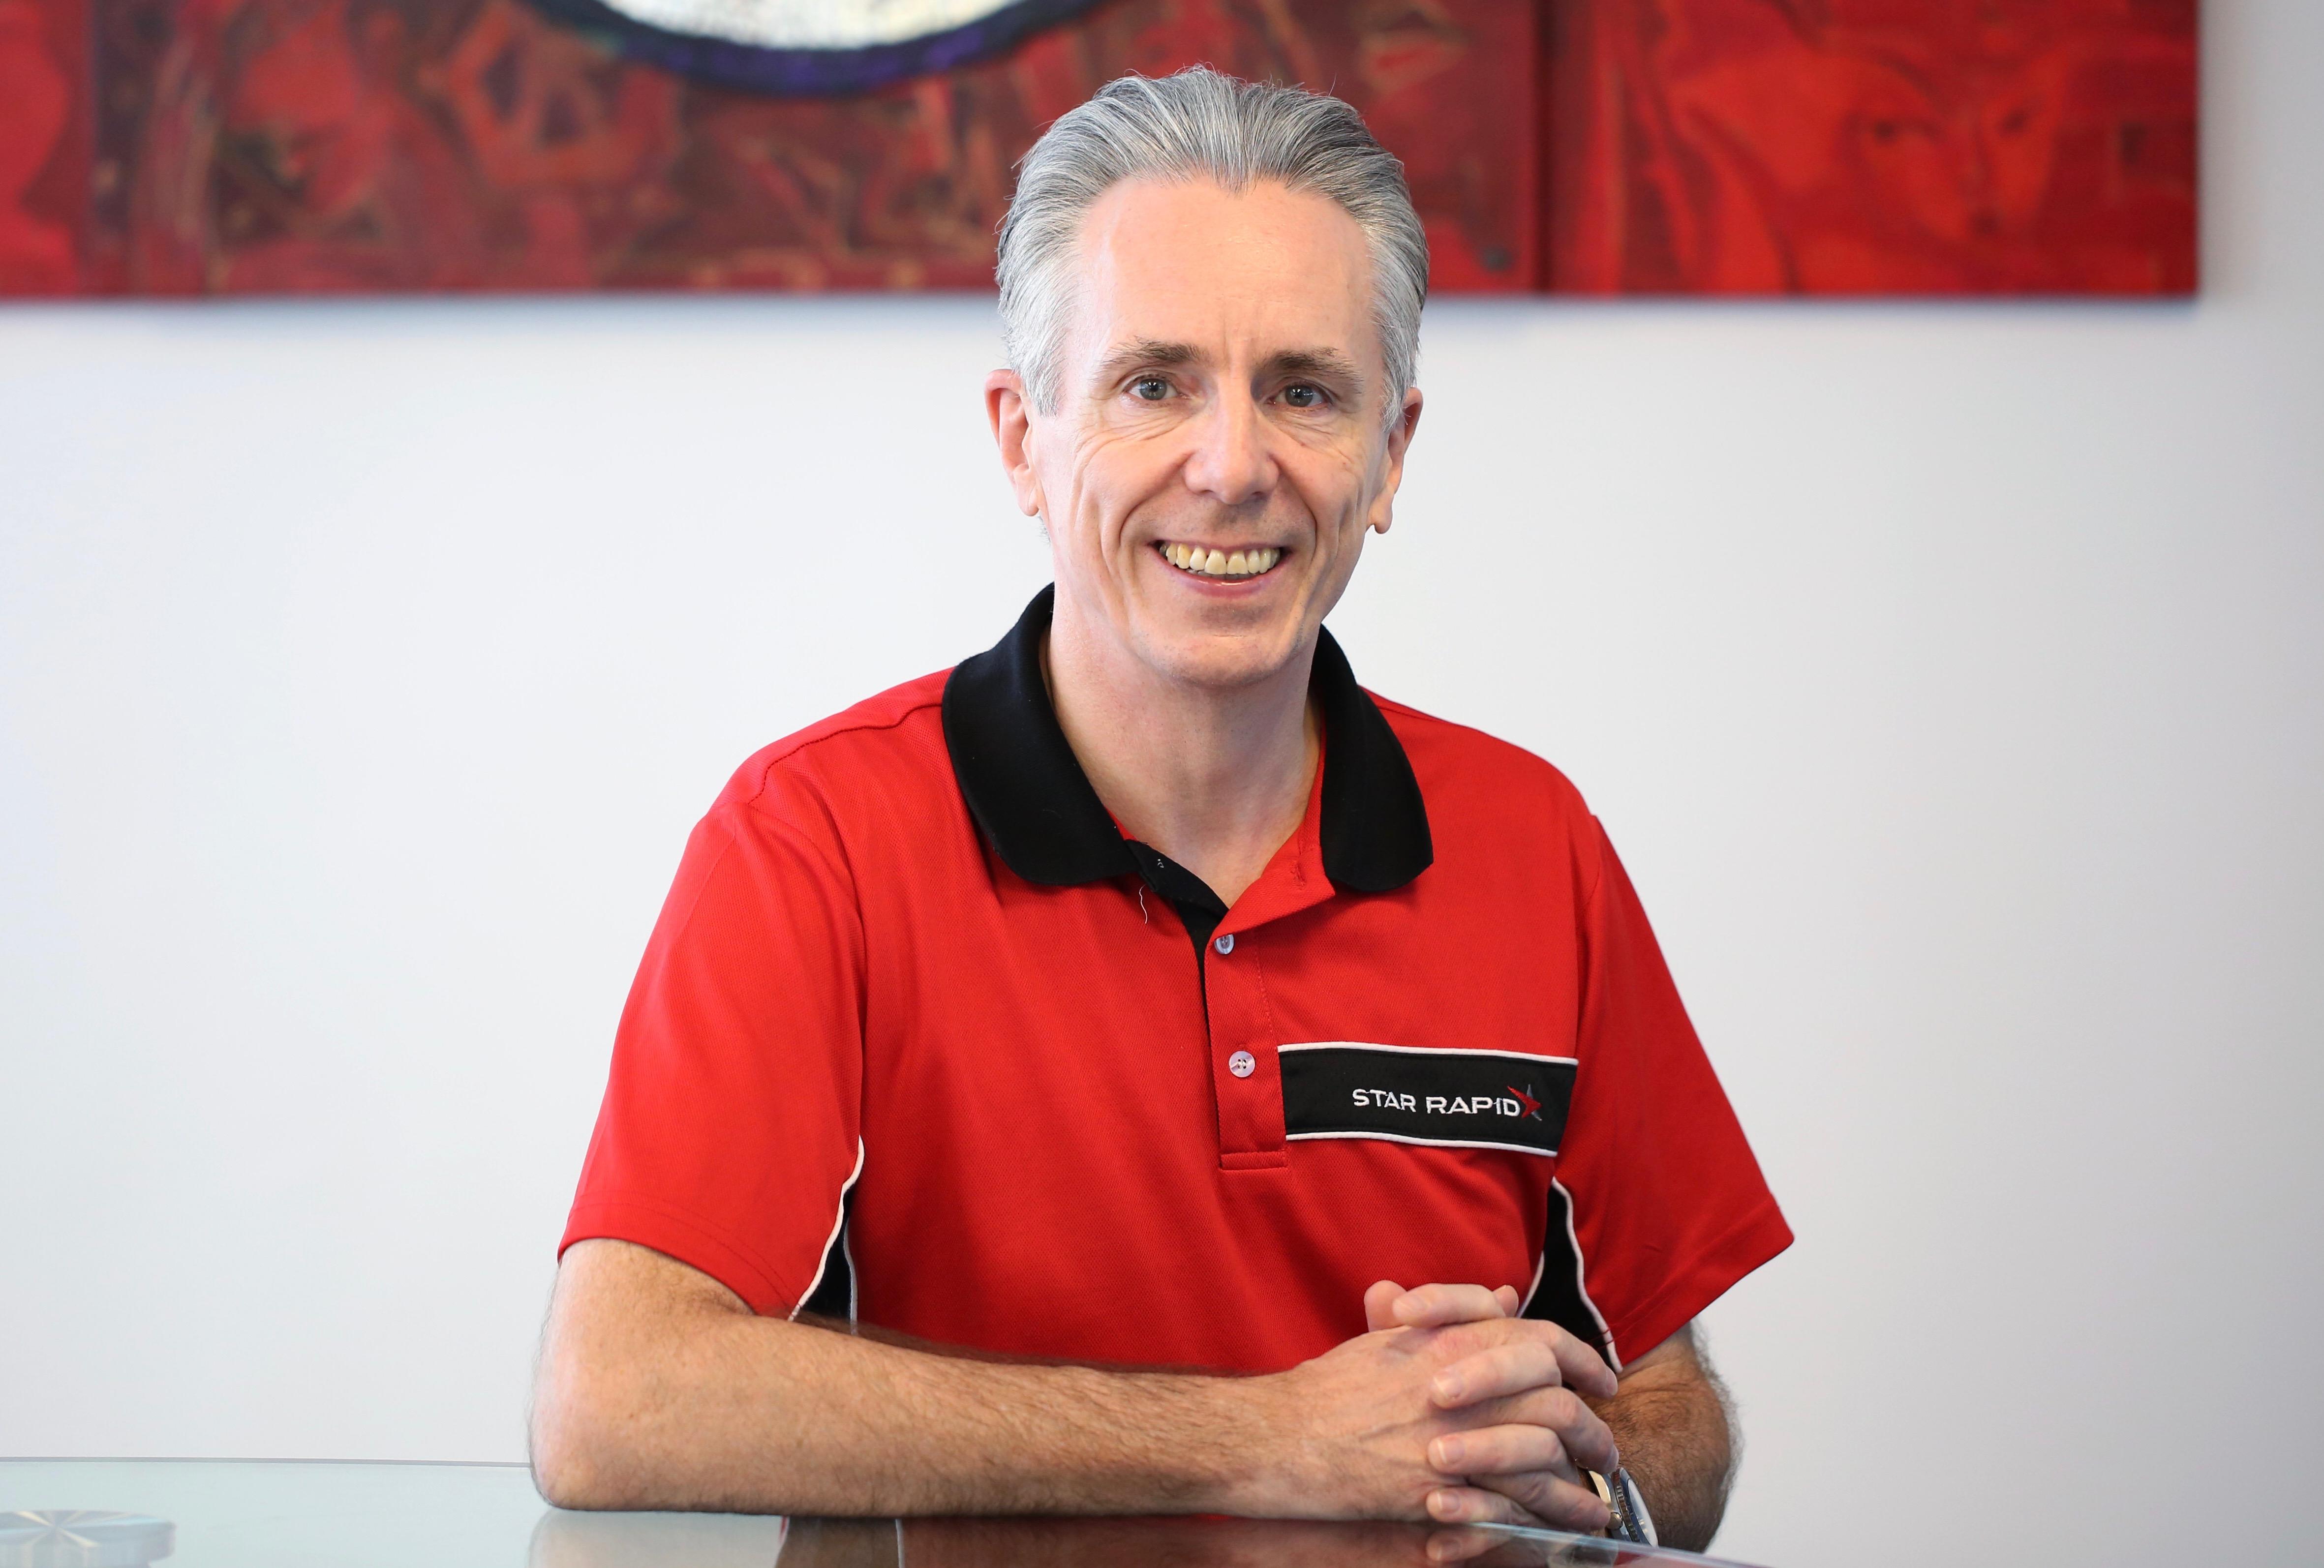 Gordon Styles, Founder